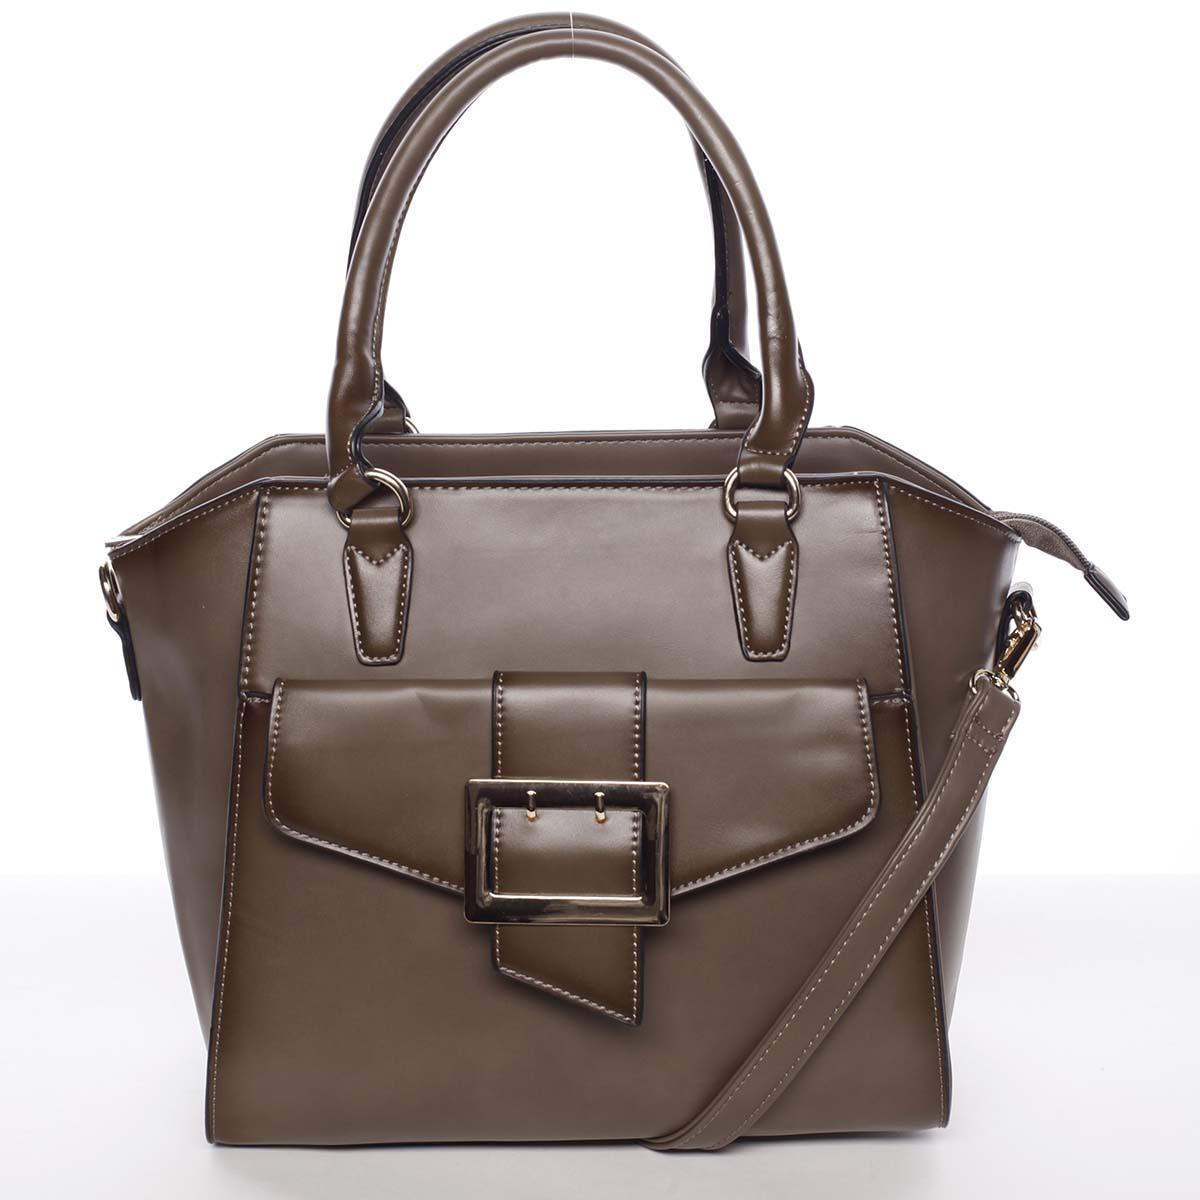 Luxusná dámska khaki kabelka cez rameno - MARIA C Thia